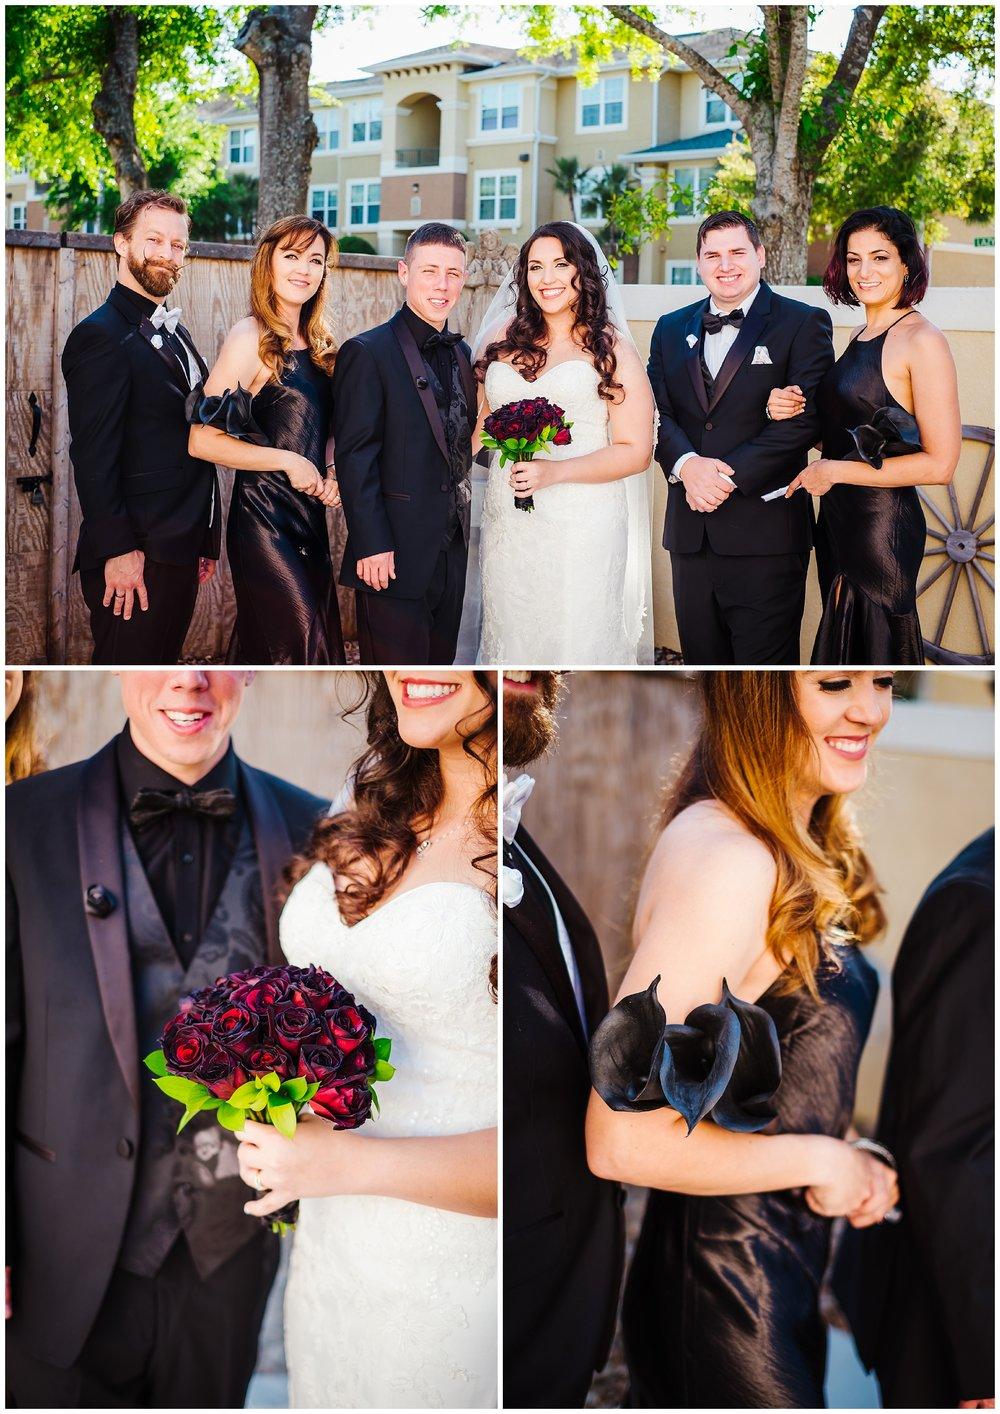 tampa-wedding-photographer-unique-indoor-venue_0032.jpg